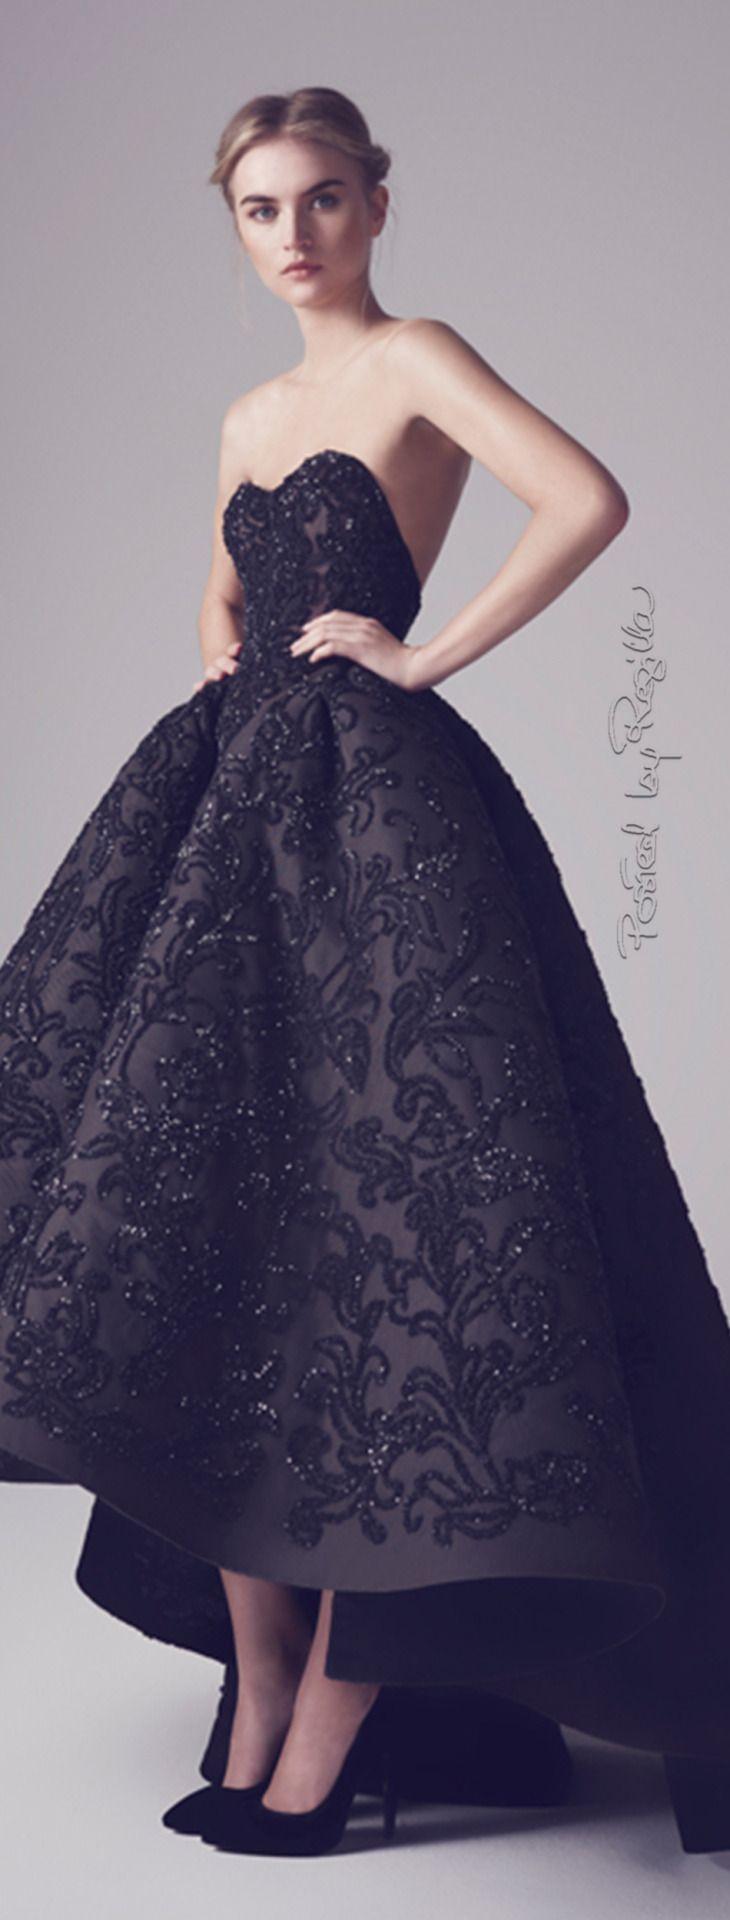 Regilla ⚜ Ashi Studio | Vestidos interesantes | Pinterest ...